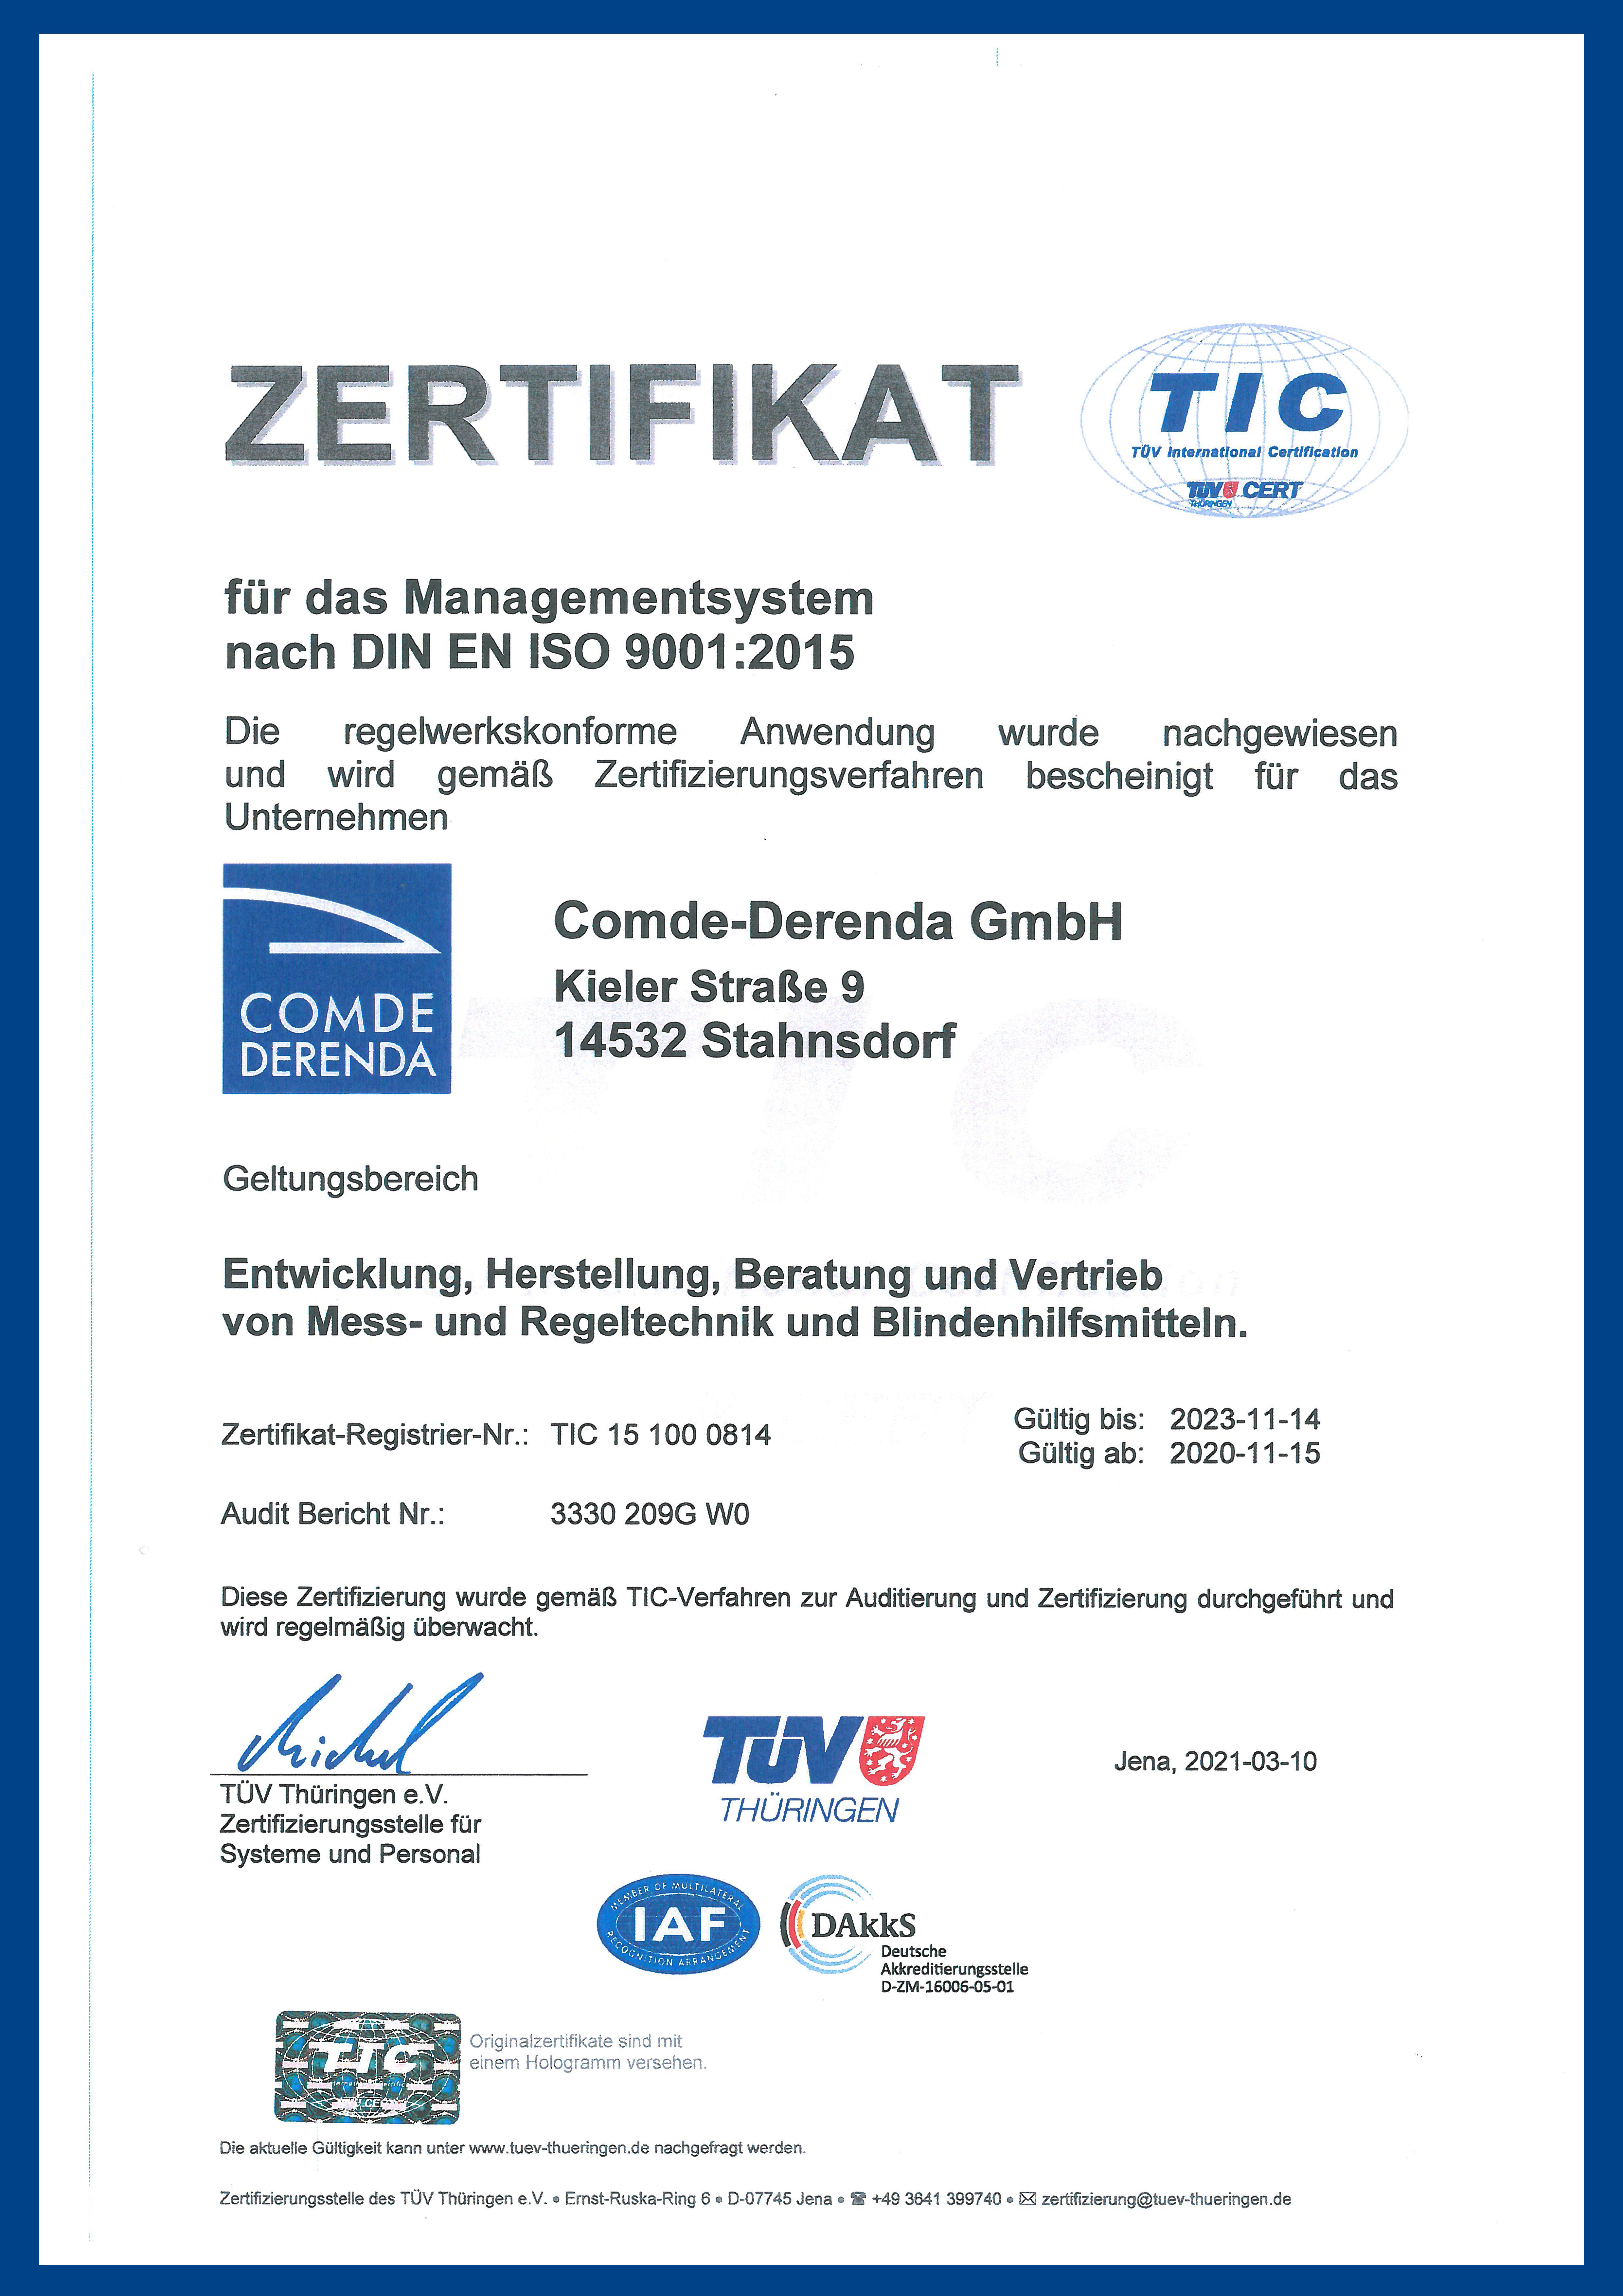 IOS-9001-Zertifikat